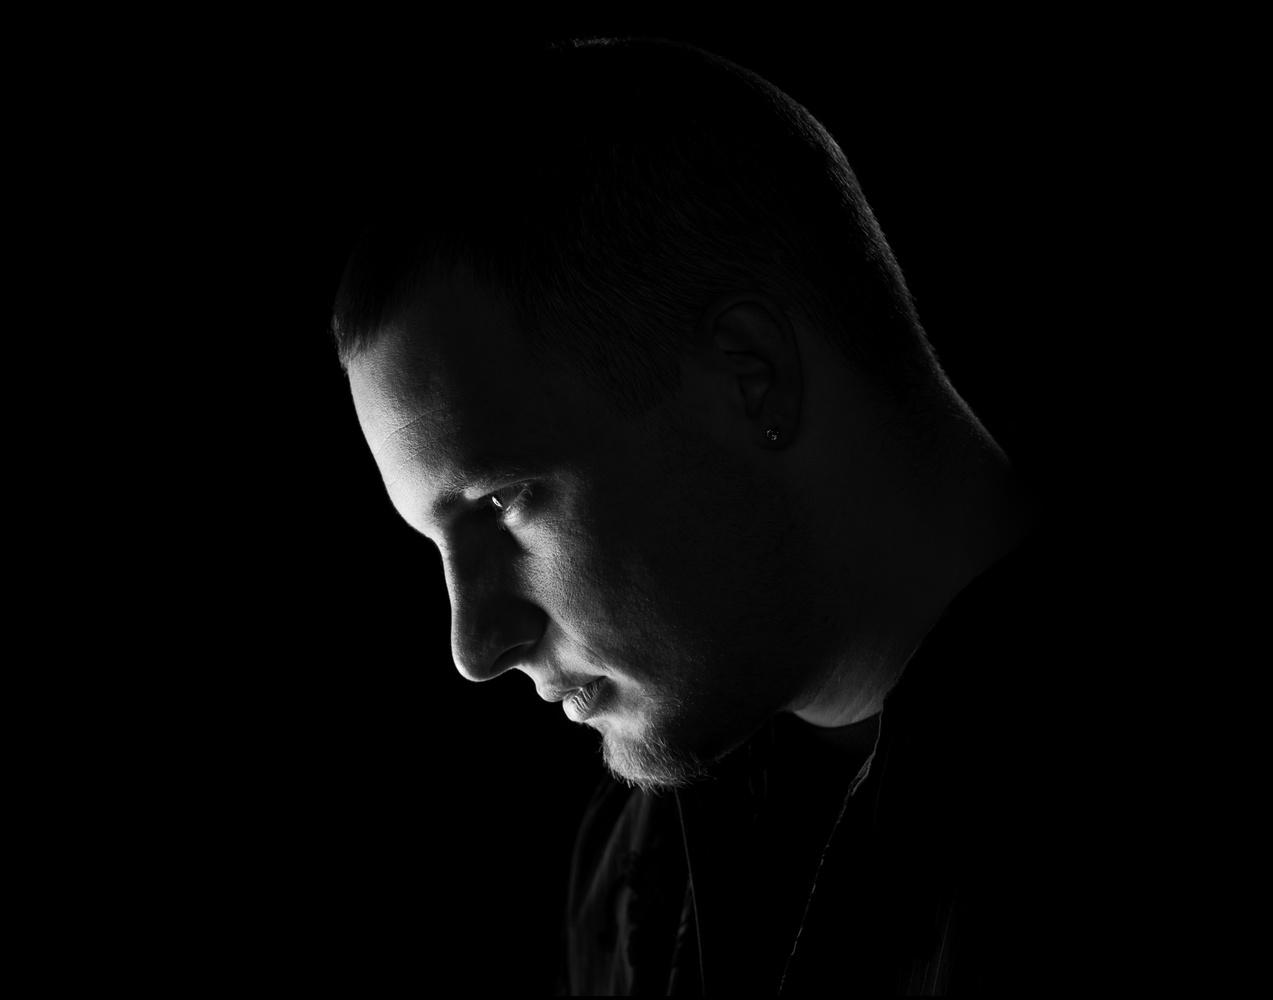 moody black and white portrait by Dan Menard